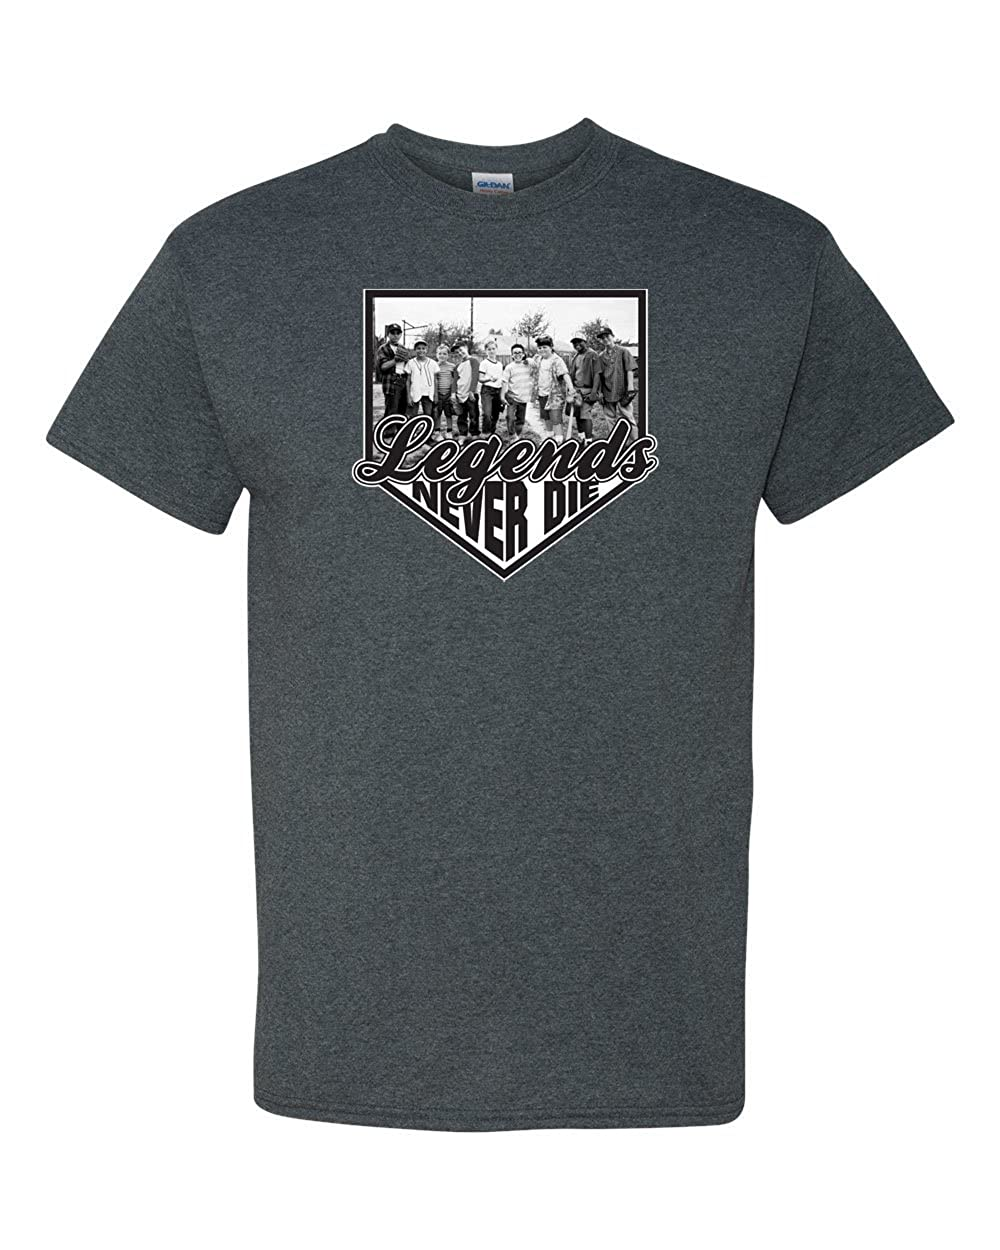 43a56f4aa Amazon.com: Legends Never Die - The Sandlot Kids Men's T-Shirt: Clothing